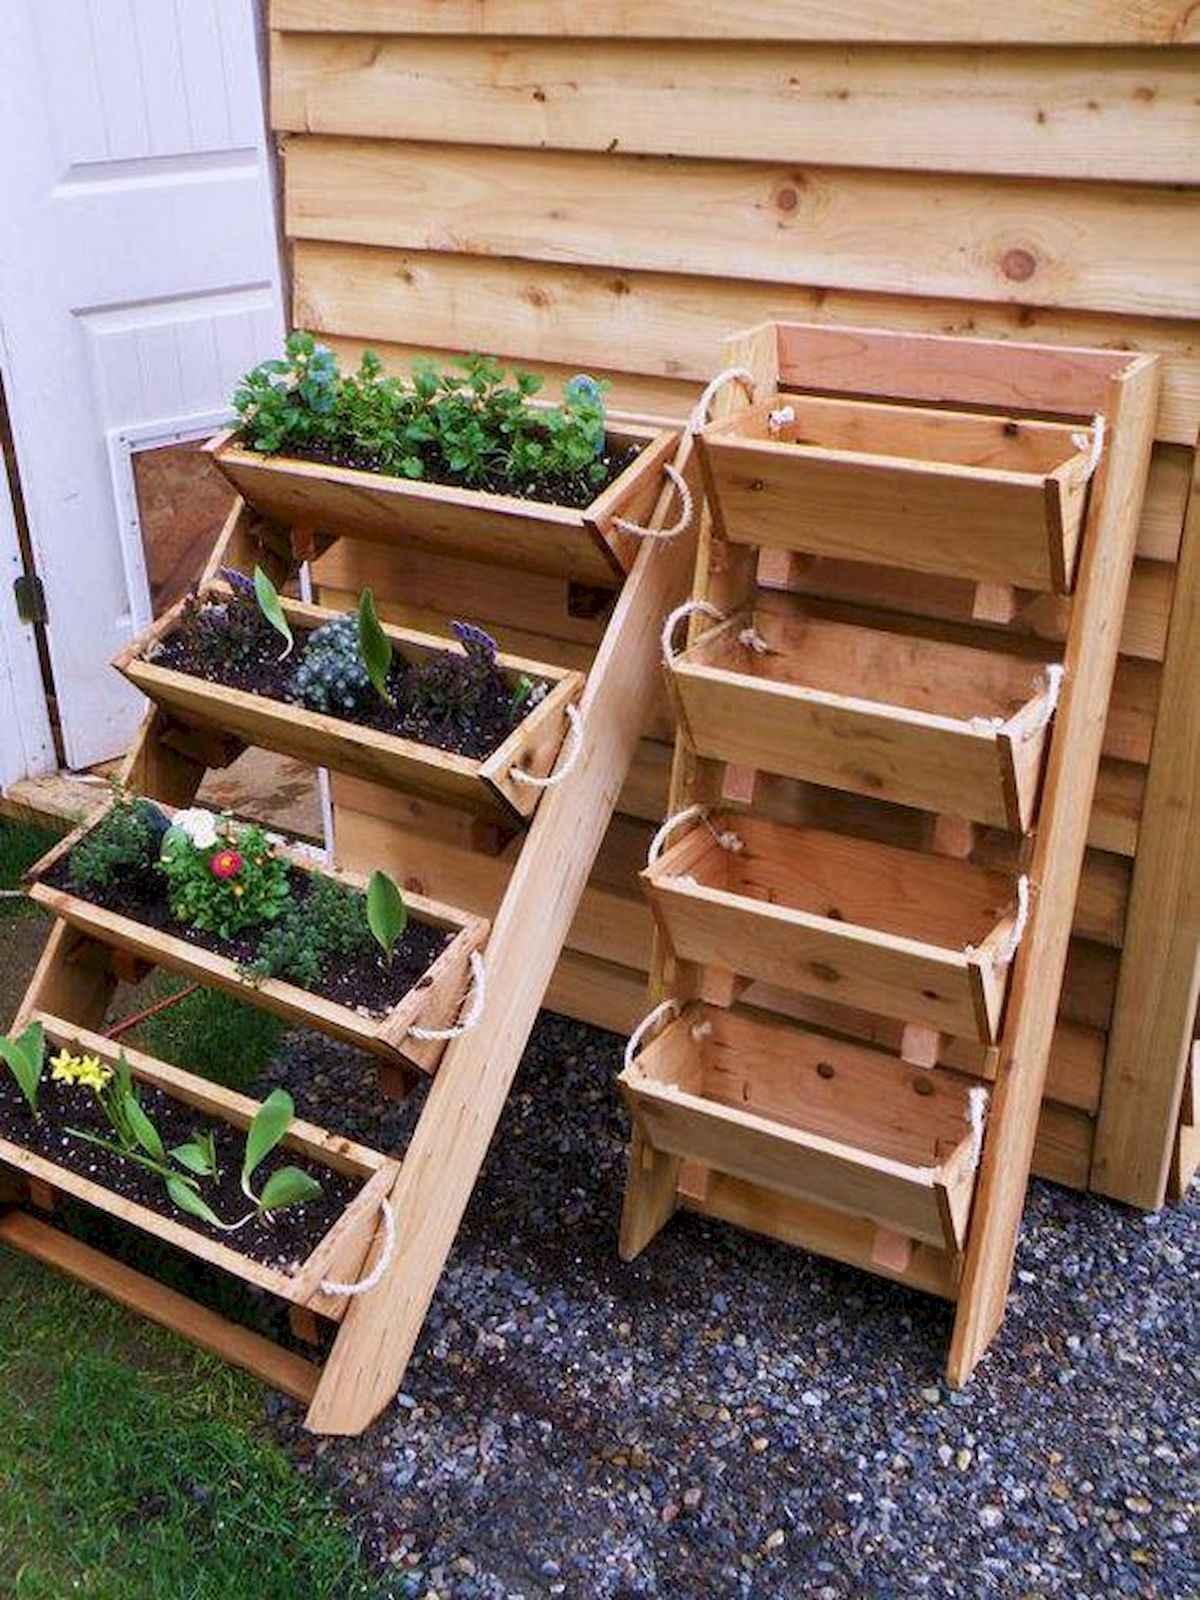 35 Inspiring Small Garden Design Ideas On A Budget 3